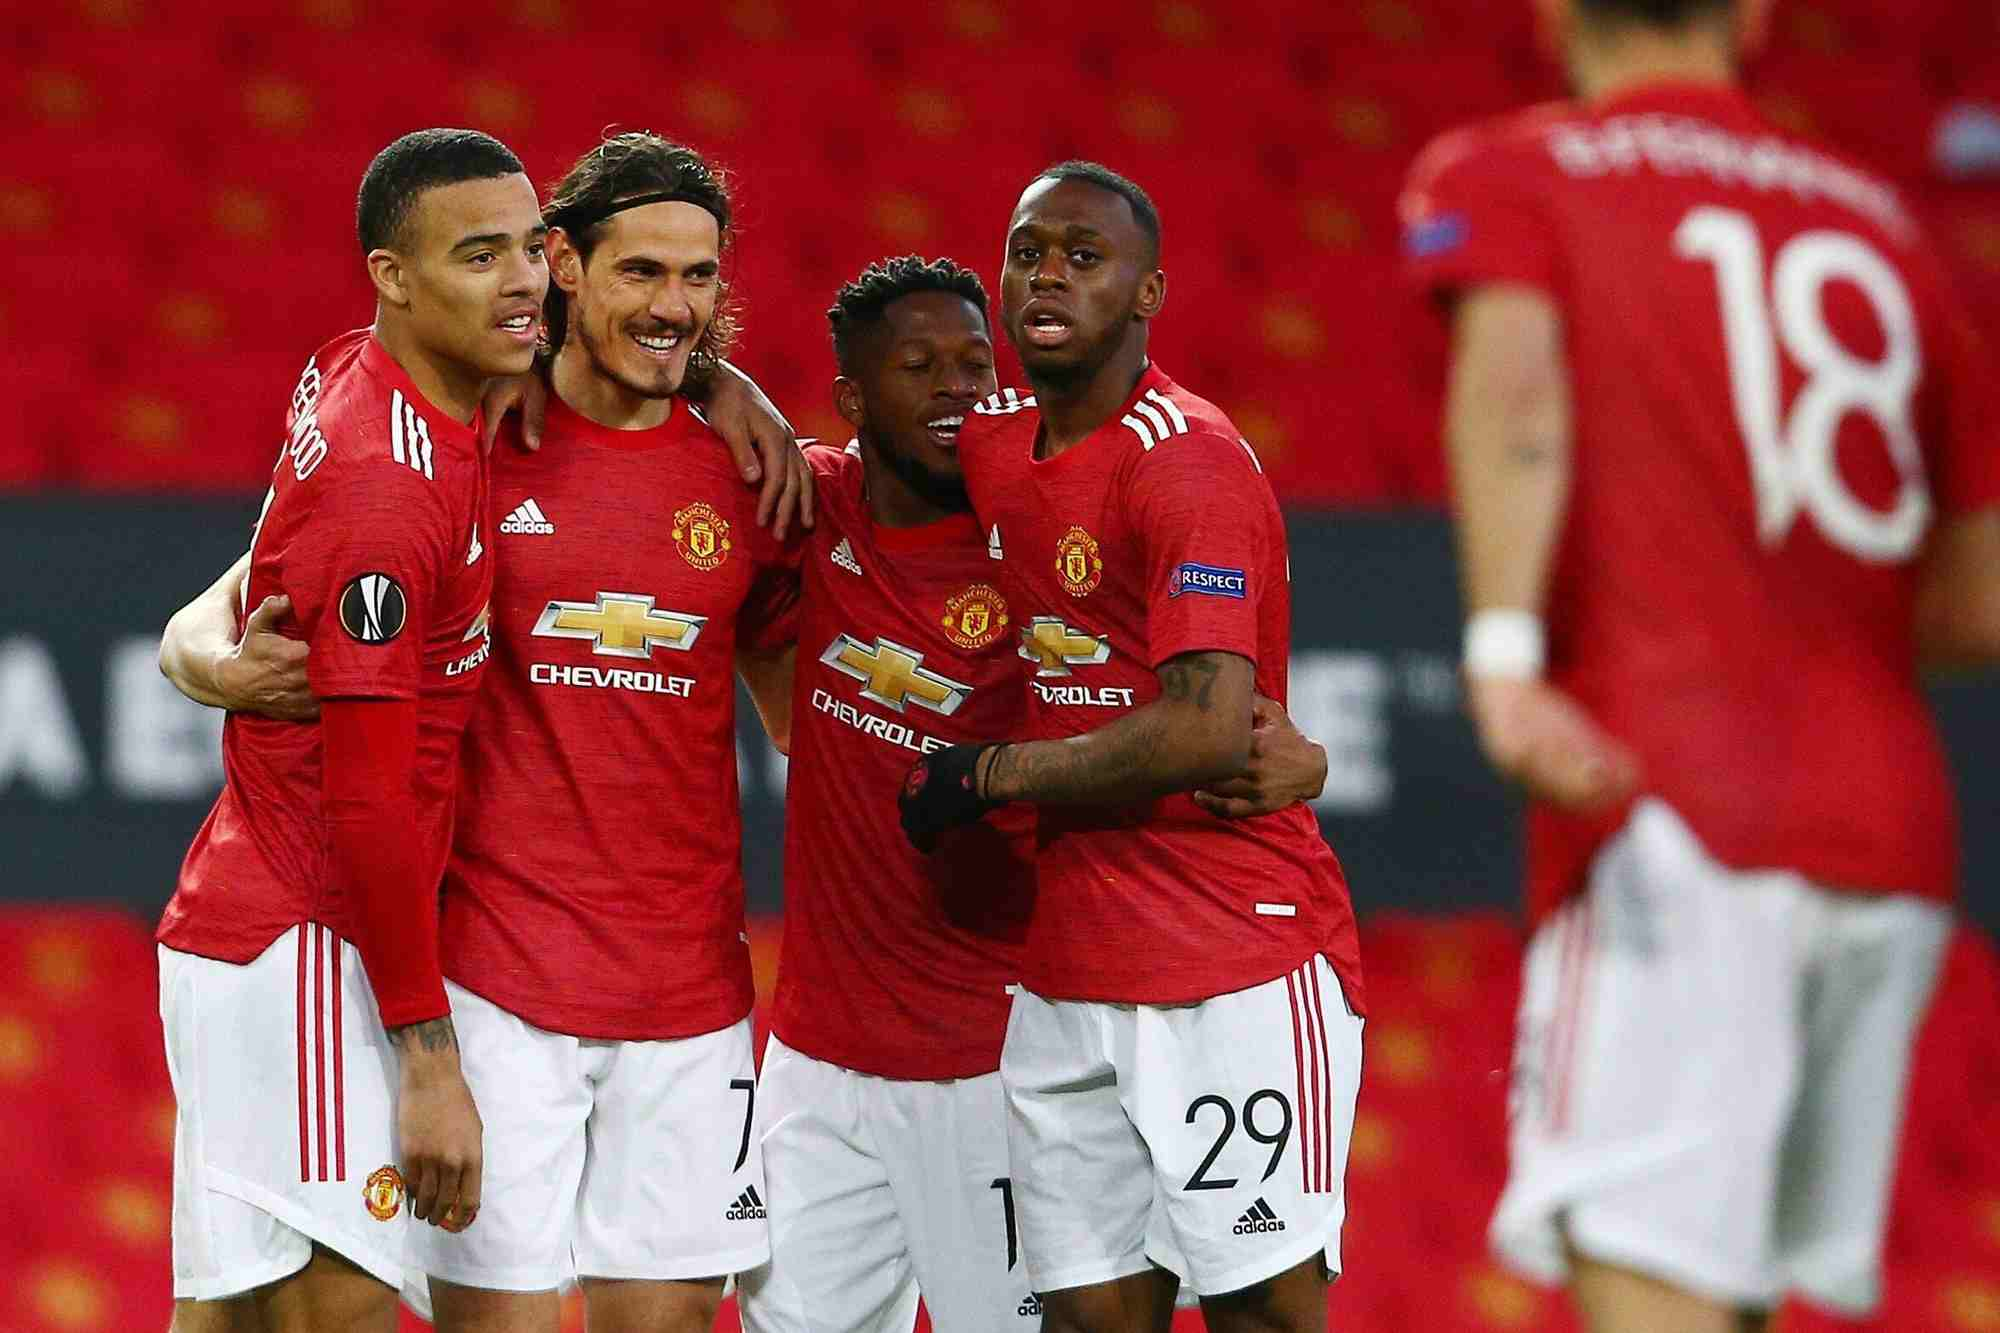 Our Complete Match Report: Manchester United vs Granada